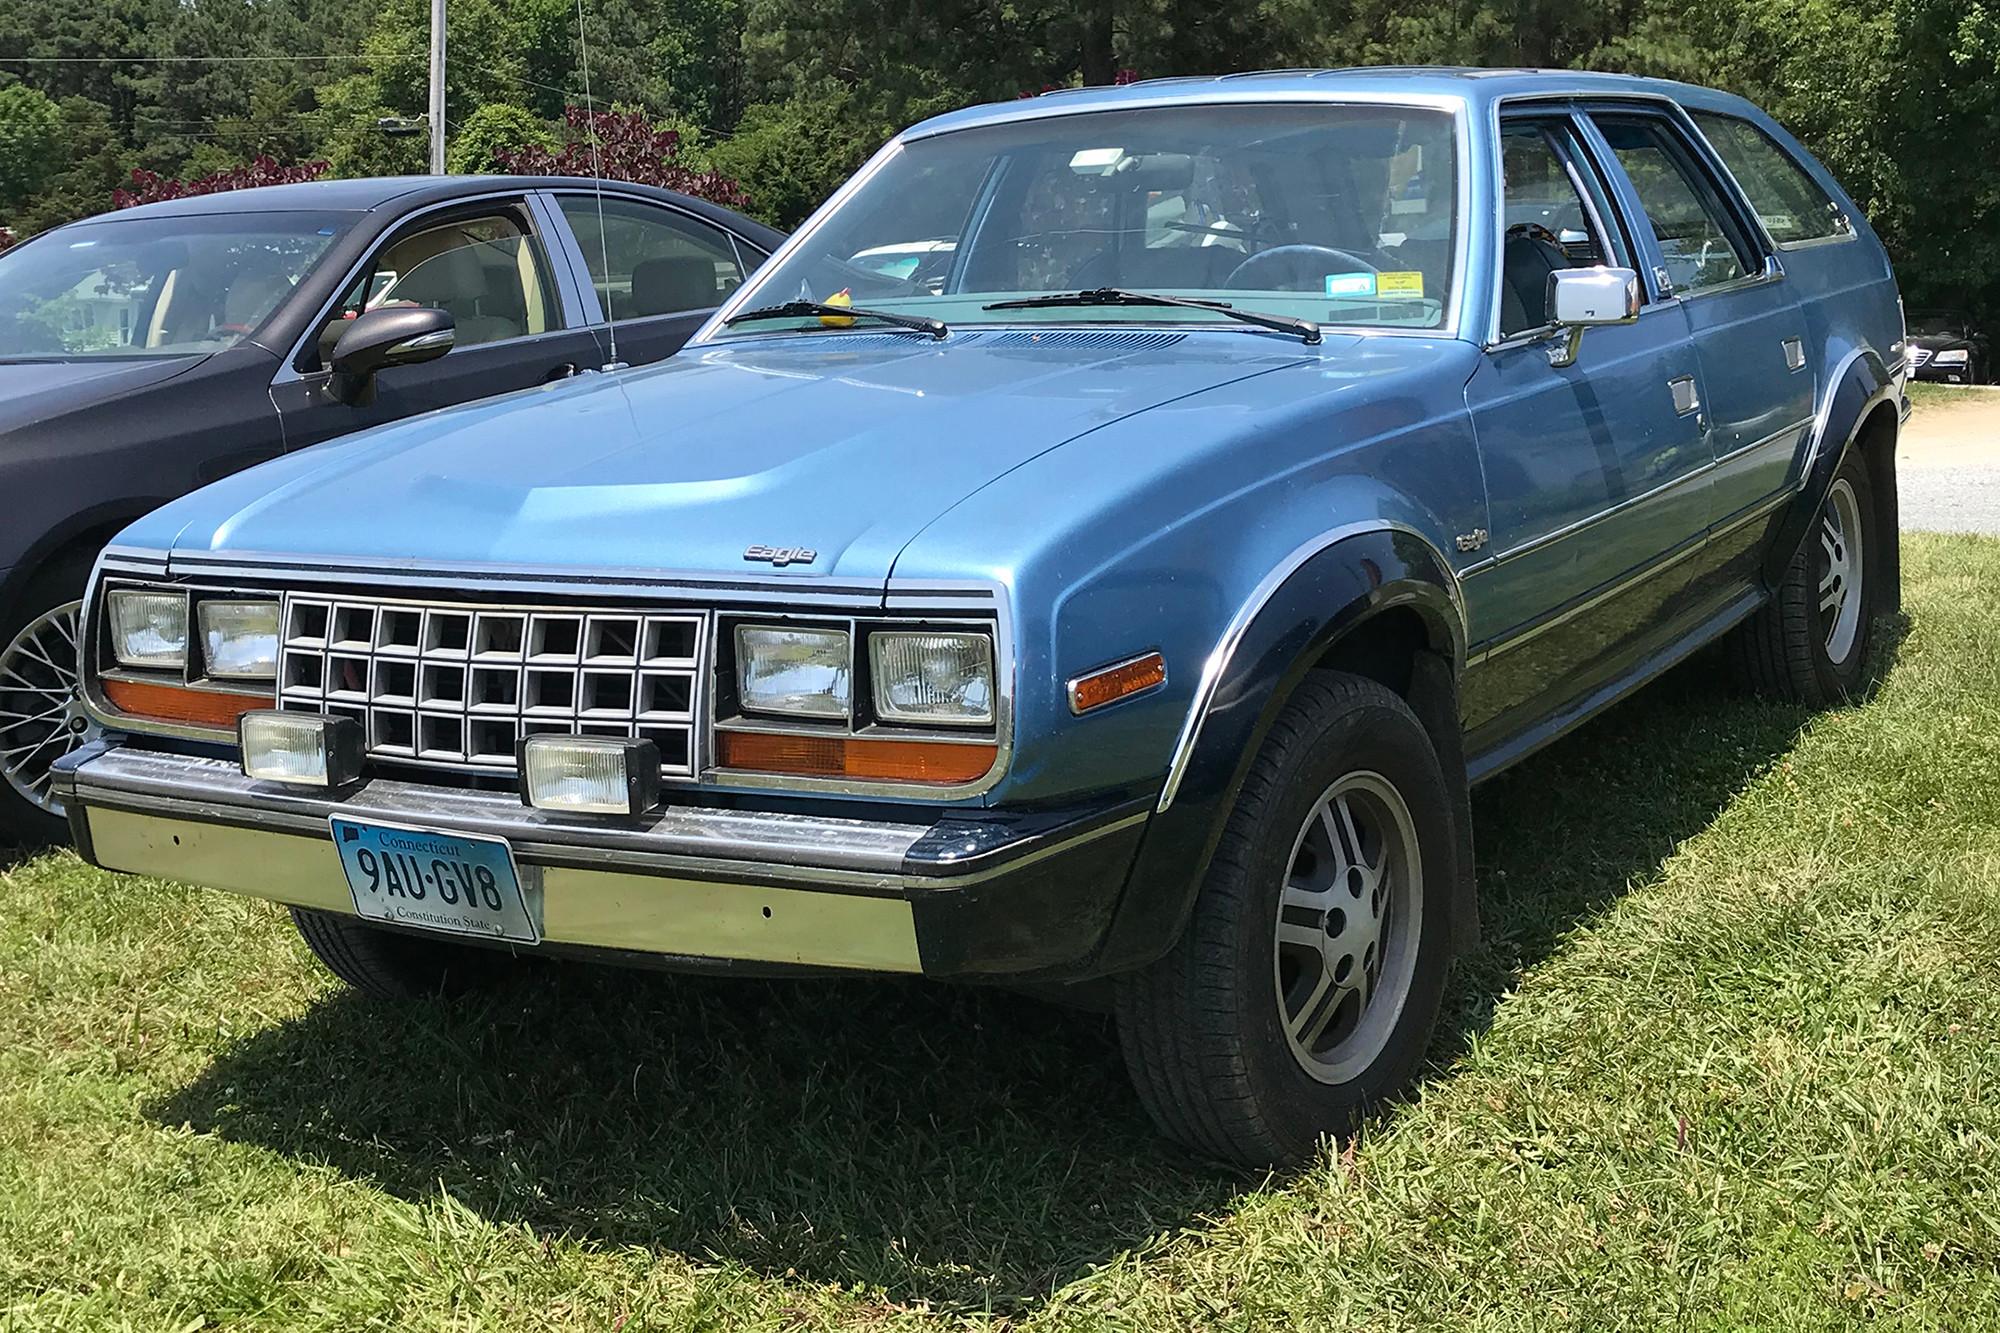 amc-eagle-1980-angle--blue--exterior--front--station-wagon.jpeg